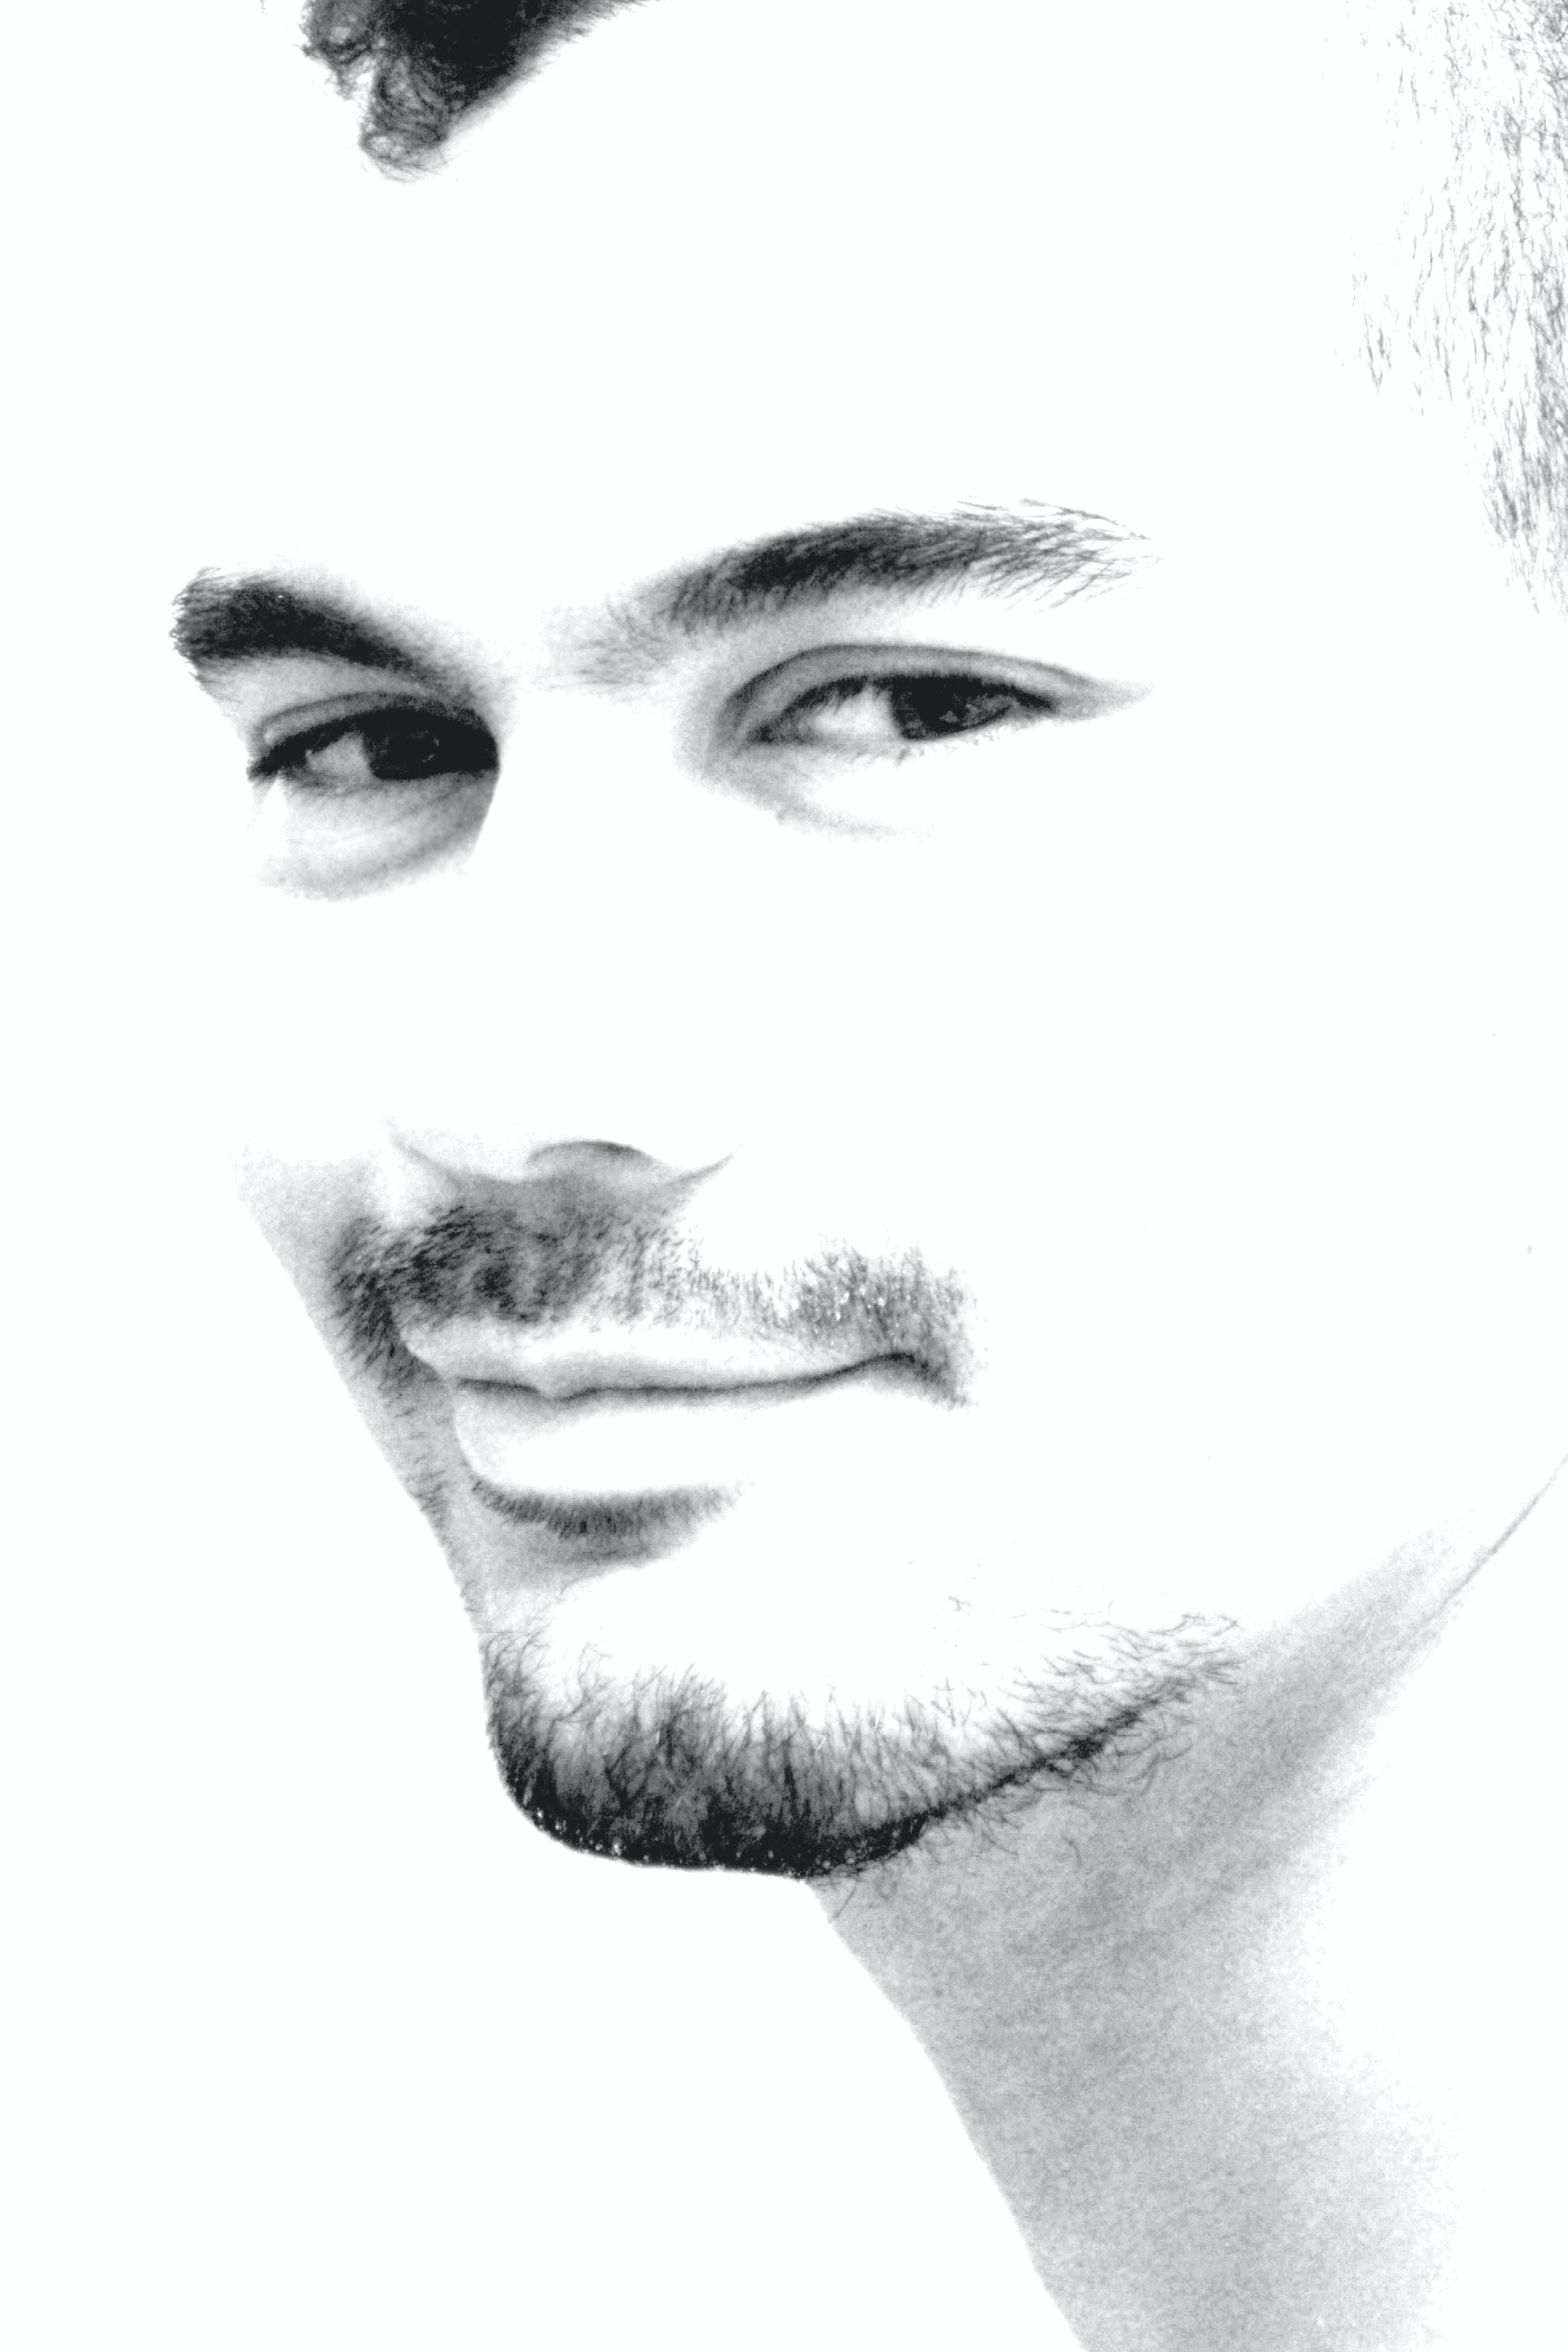 Go to Joel M Mathey's profile